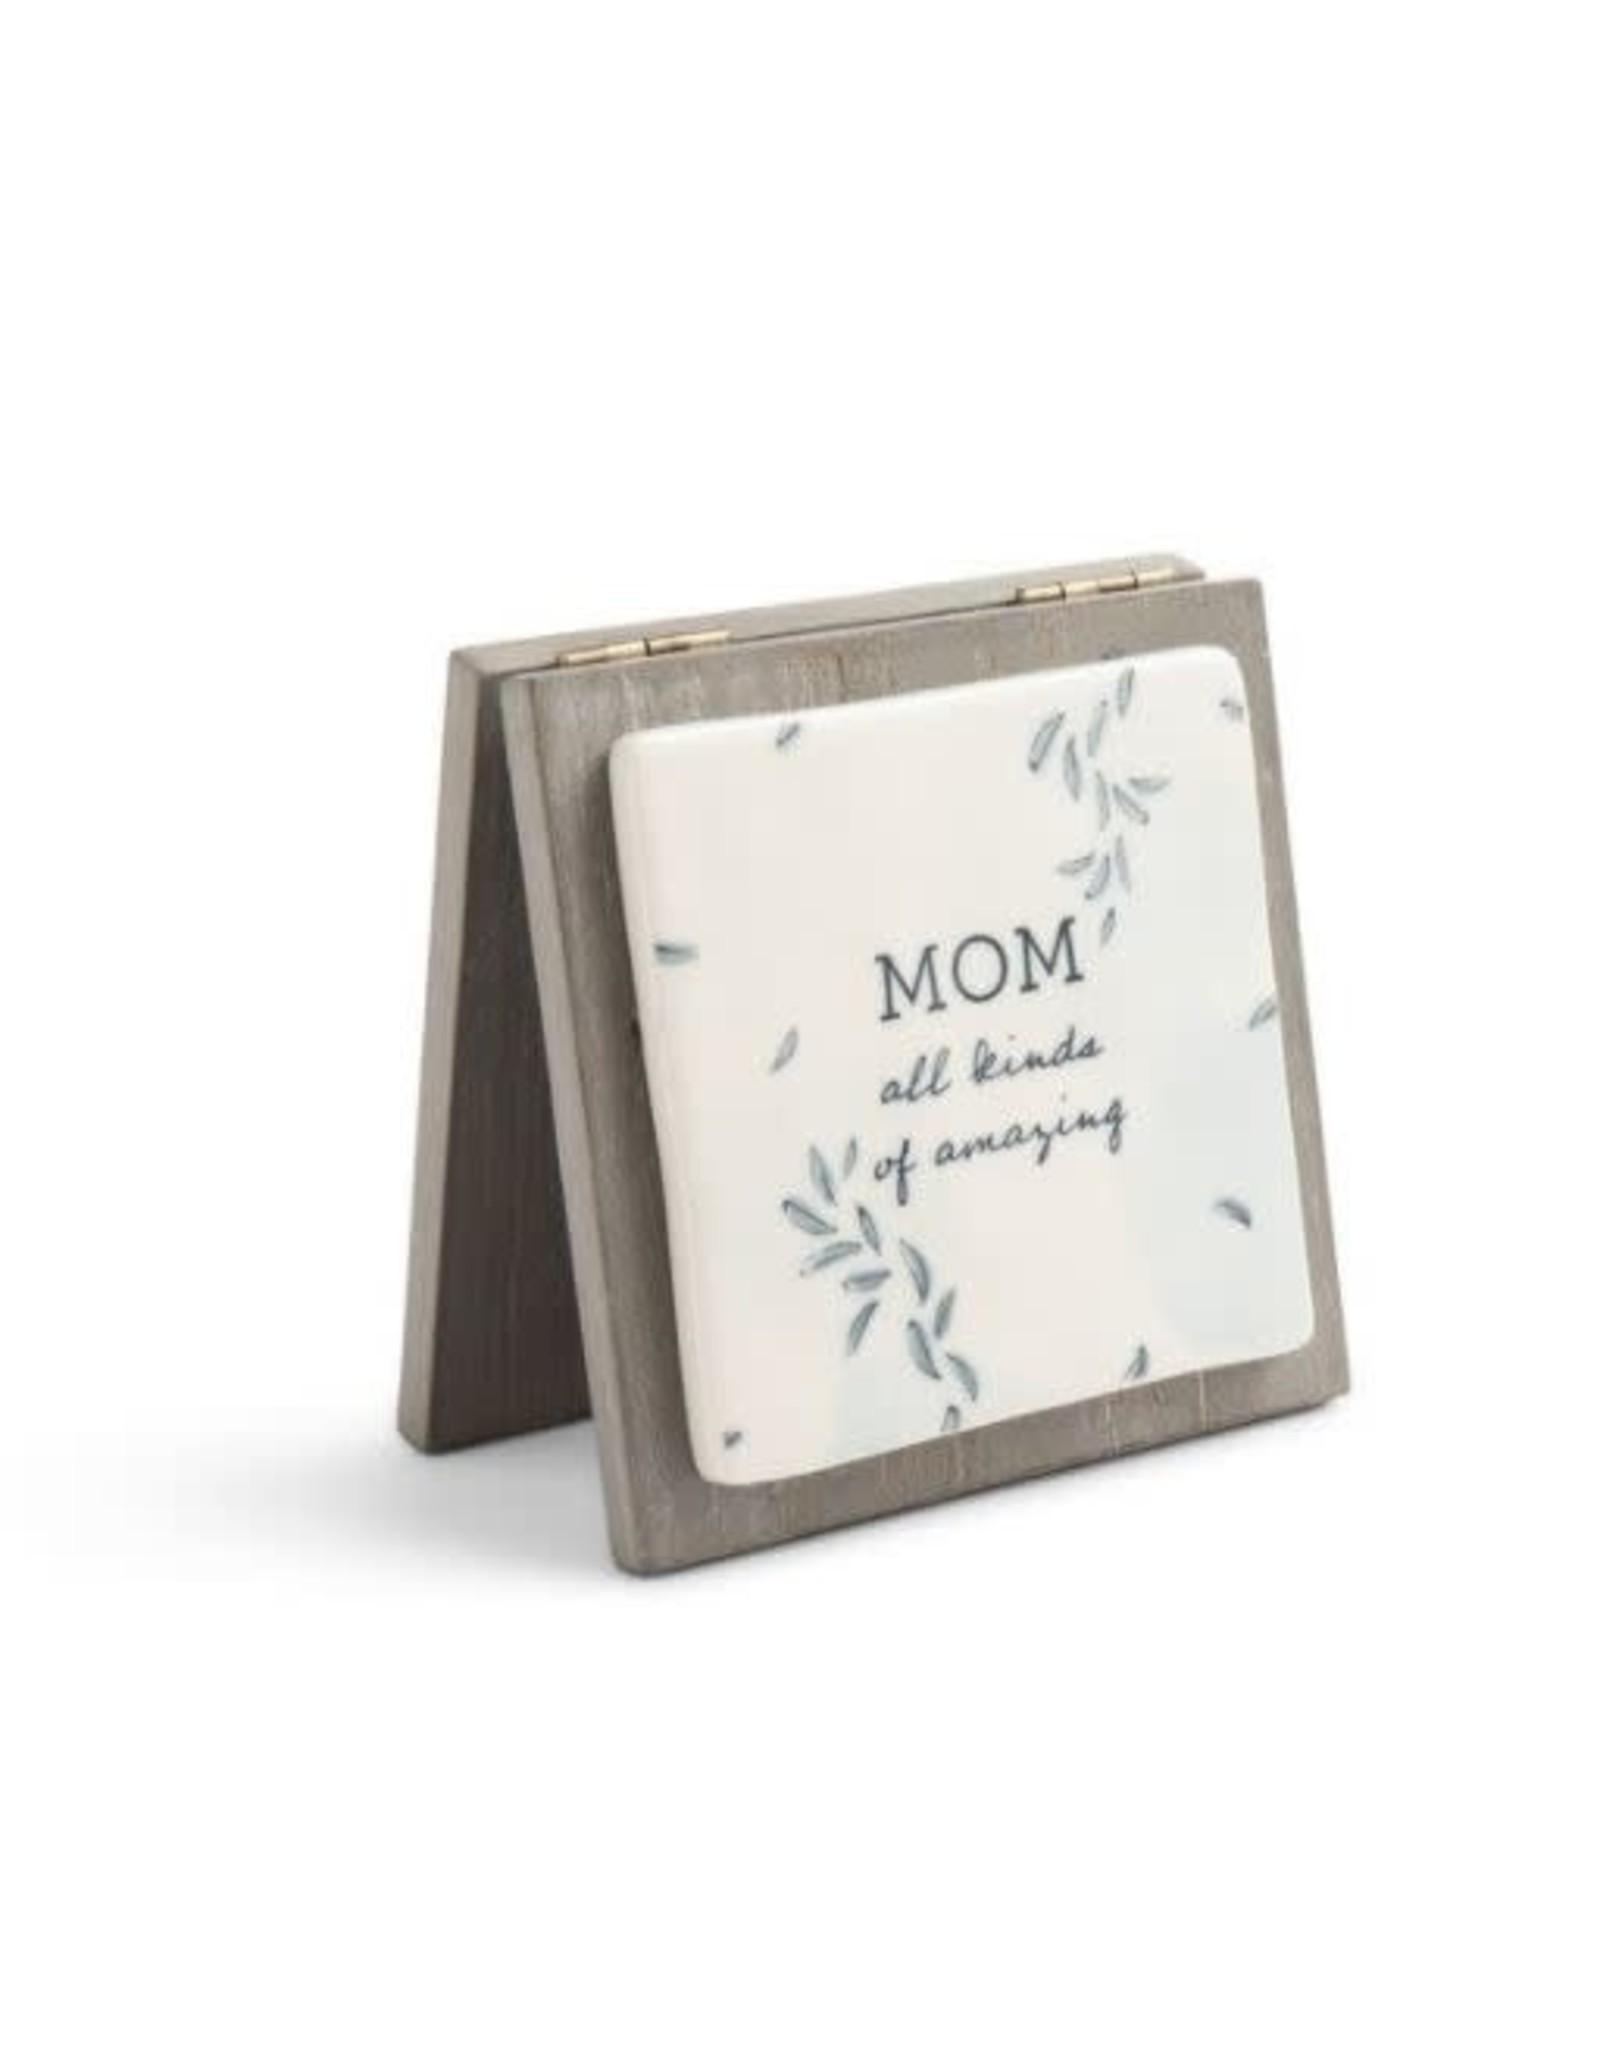 Demdaco AMAZING MOM FOREVER CARD